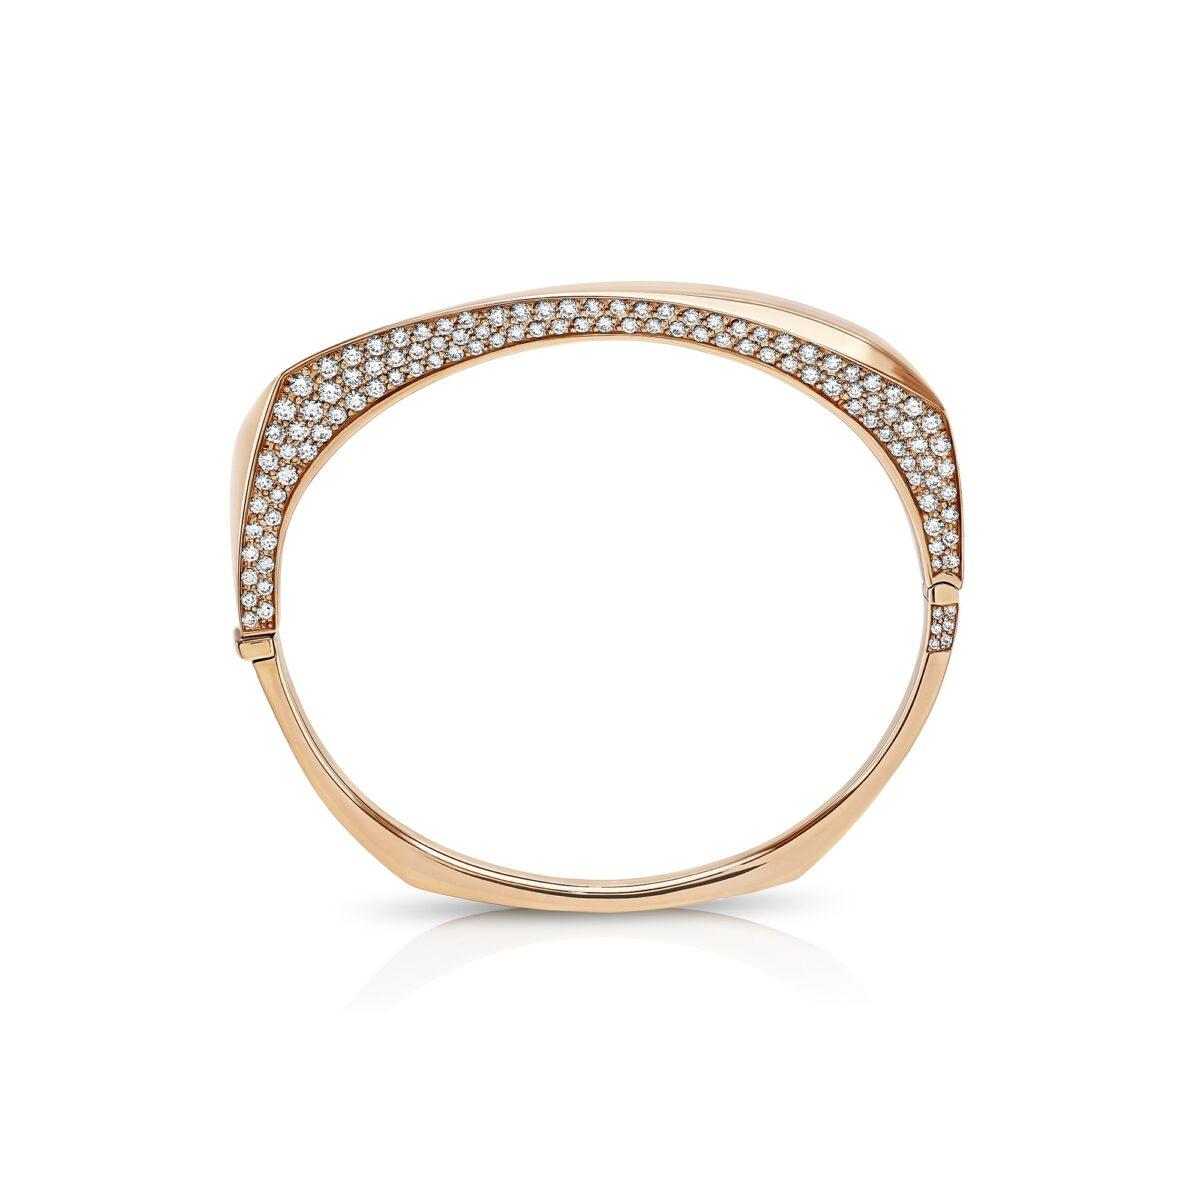 Cleo Rose Gold 'Secret' Diamond Bangle